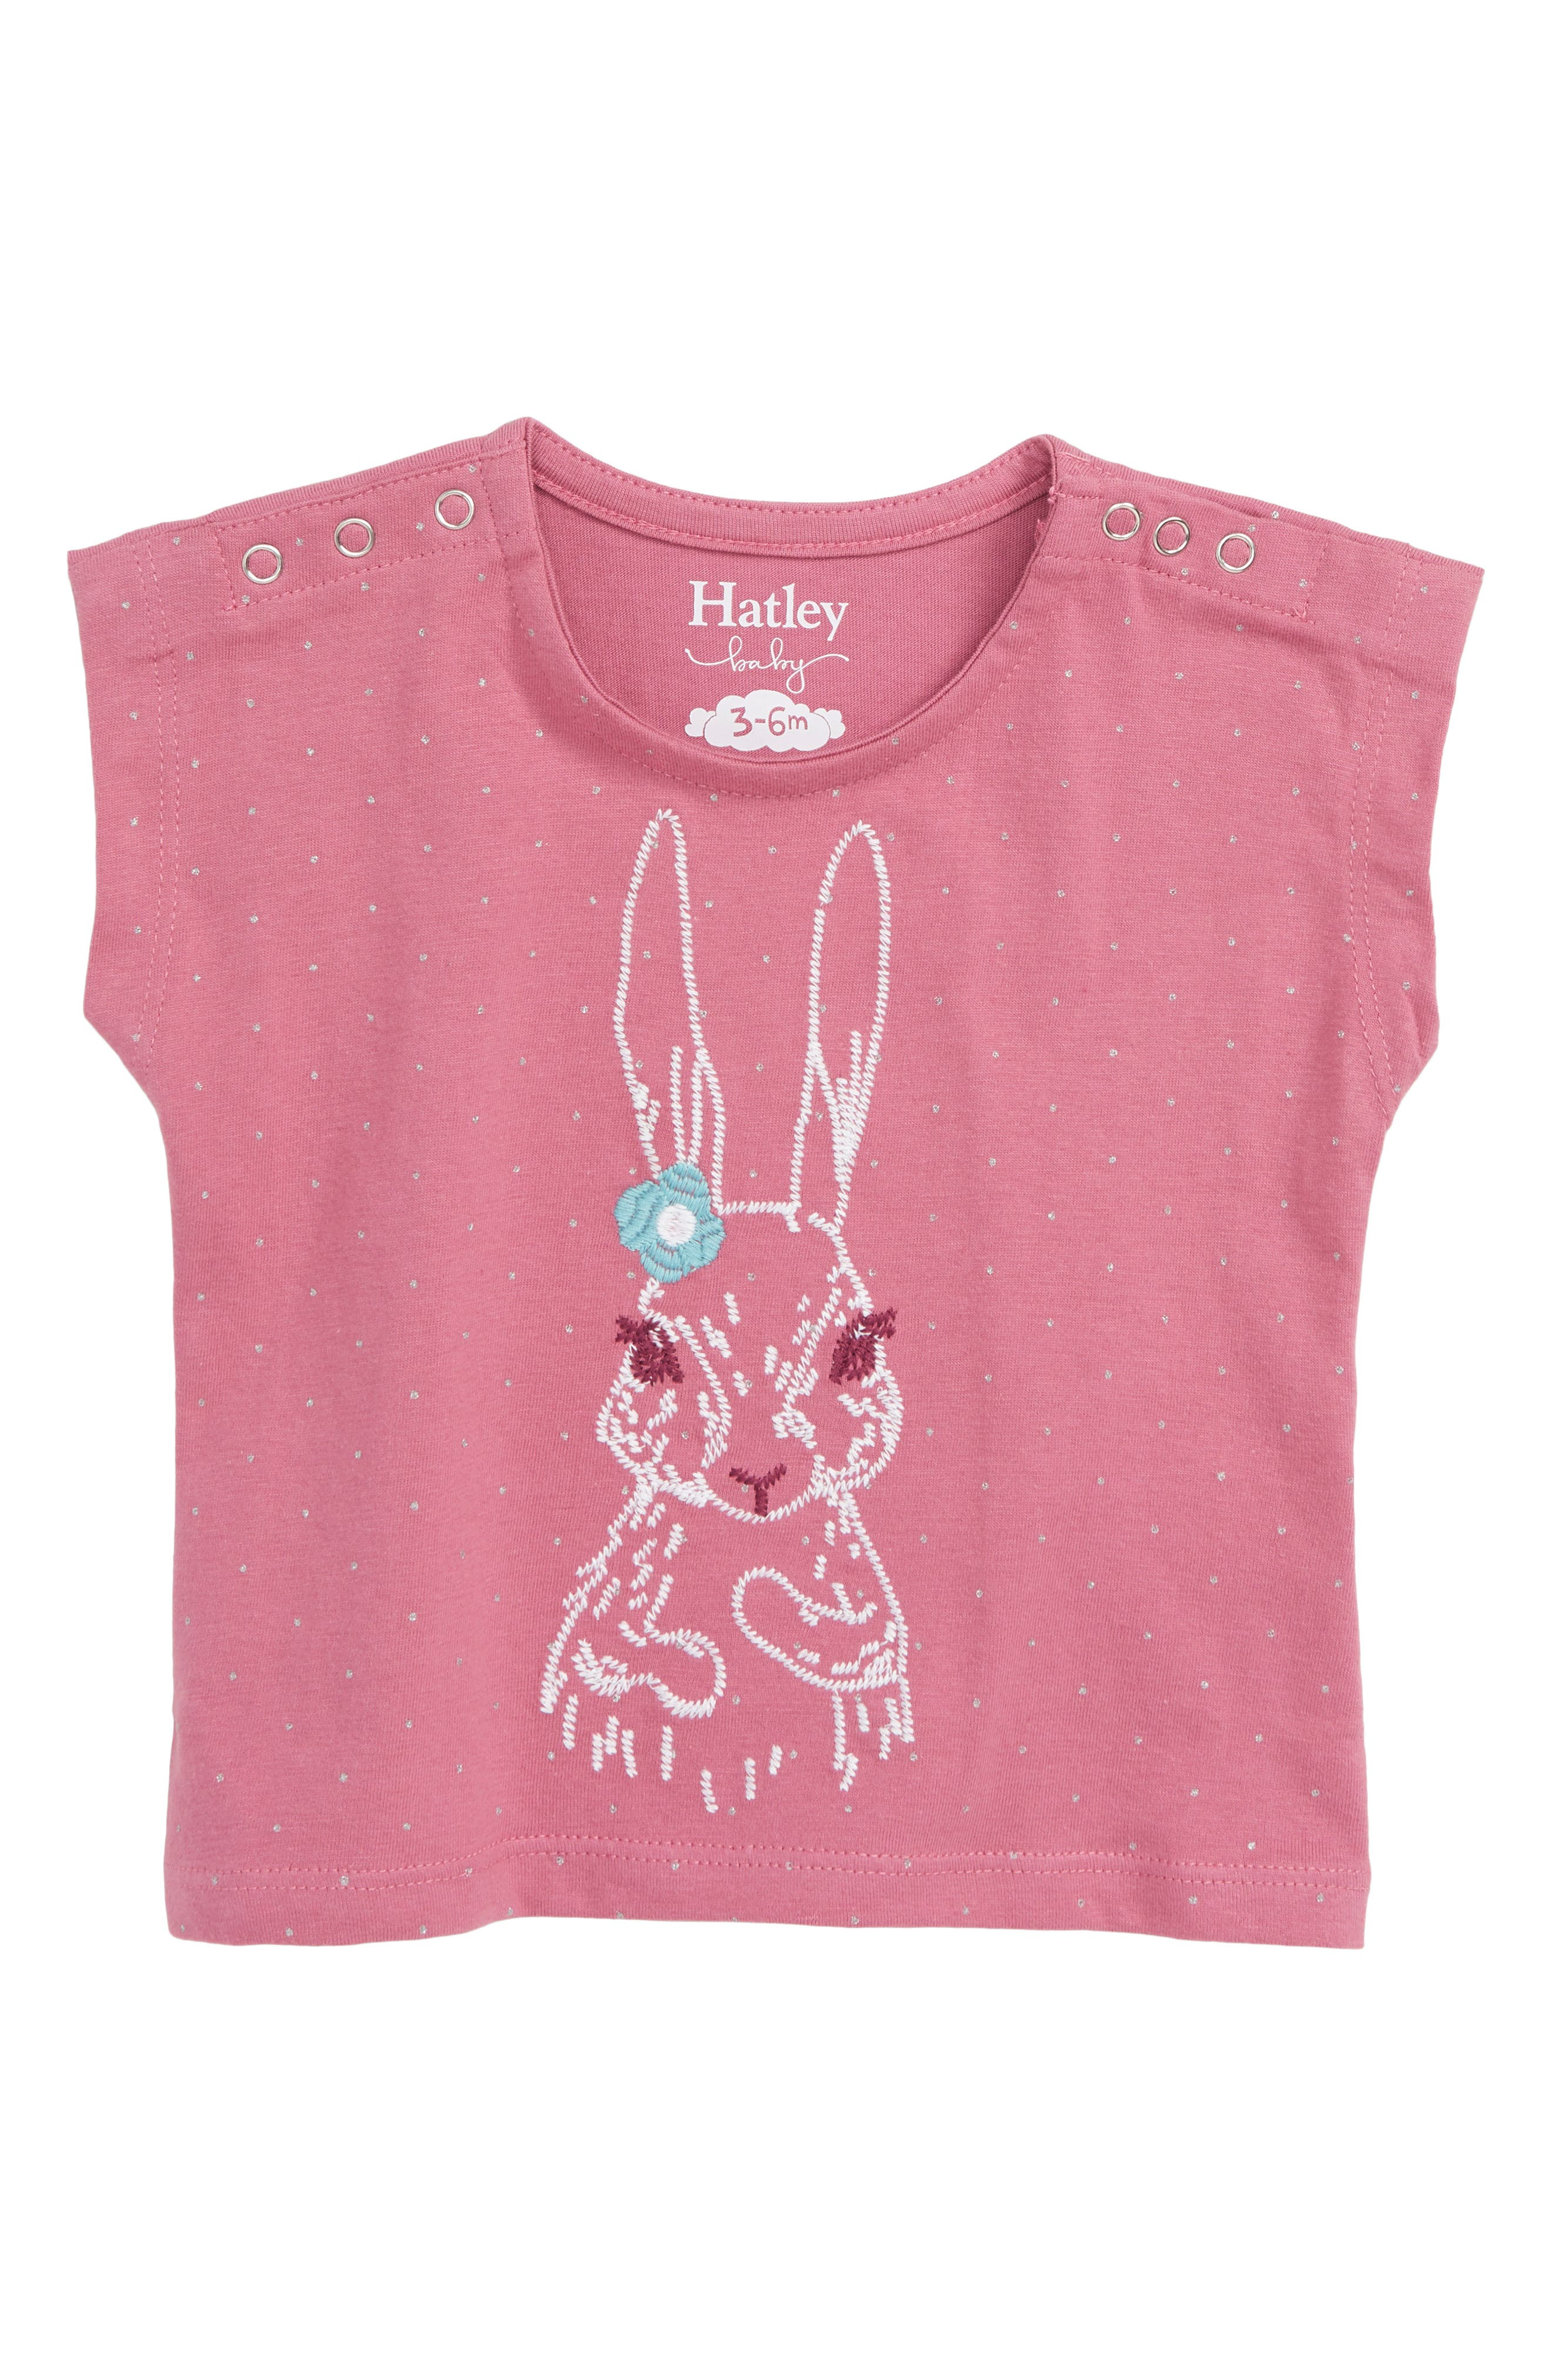 HATLEY, Pretty Bunny Organic Cotton T-Shirt, Main thumbnail 1, color, 650